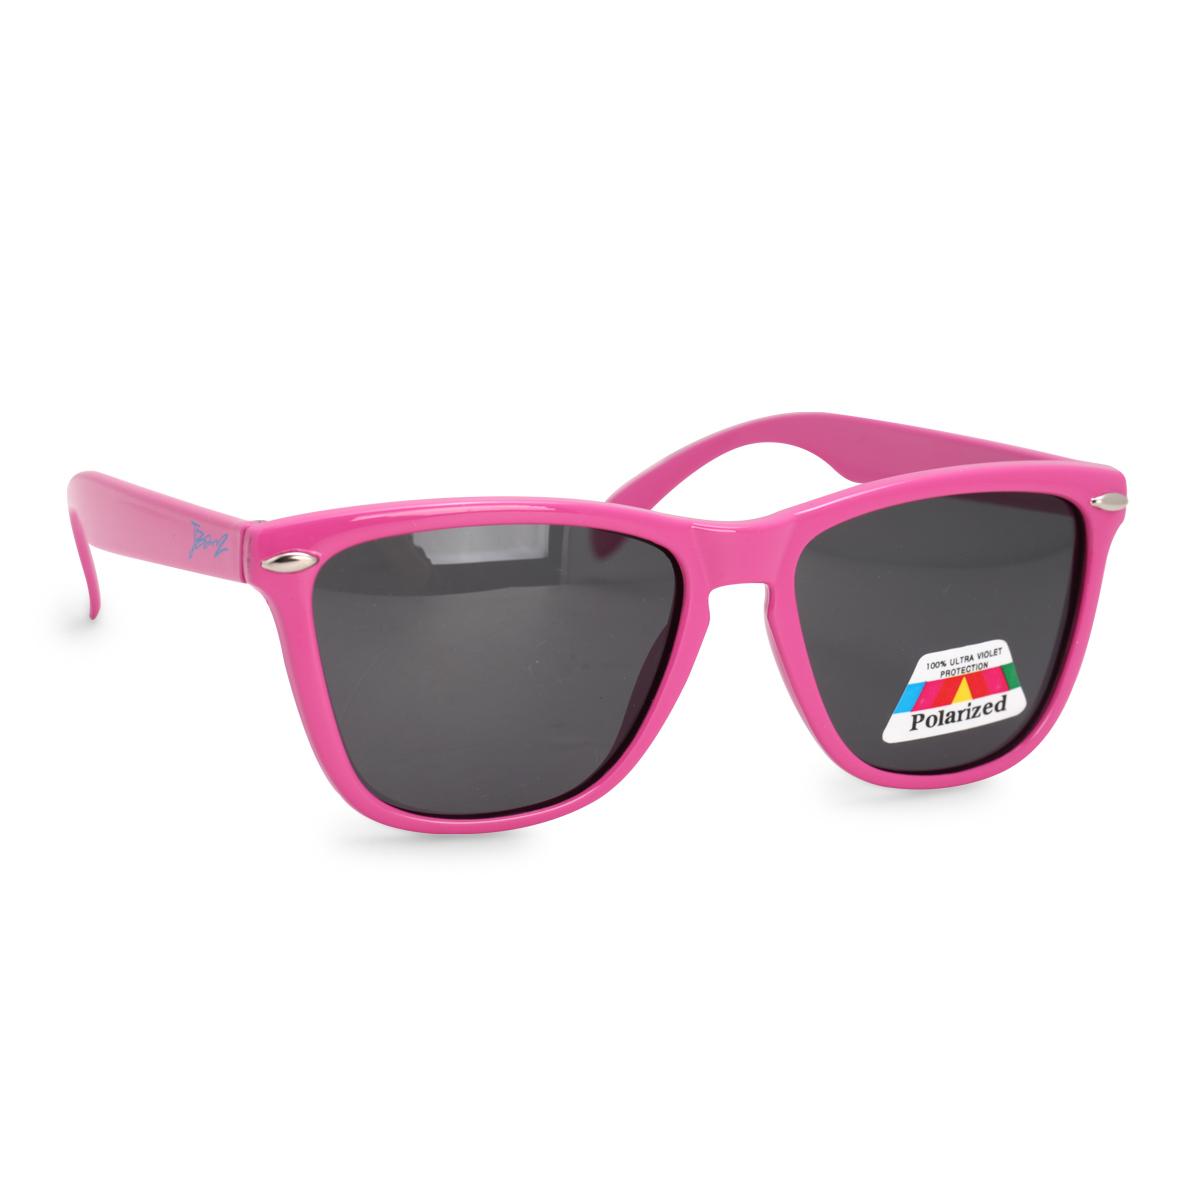 7aea141d32 USD 52.87  Australia baby banz anti-UV children s sunglasses baby ...